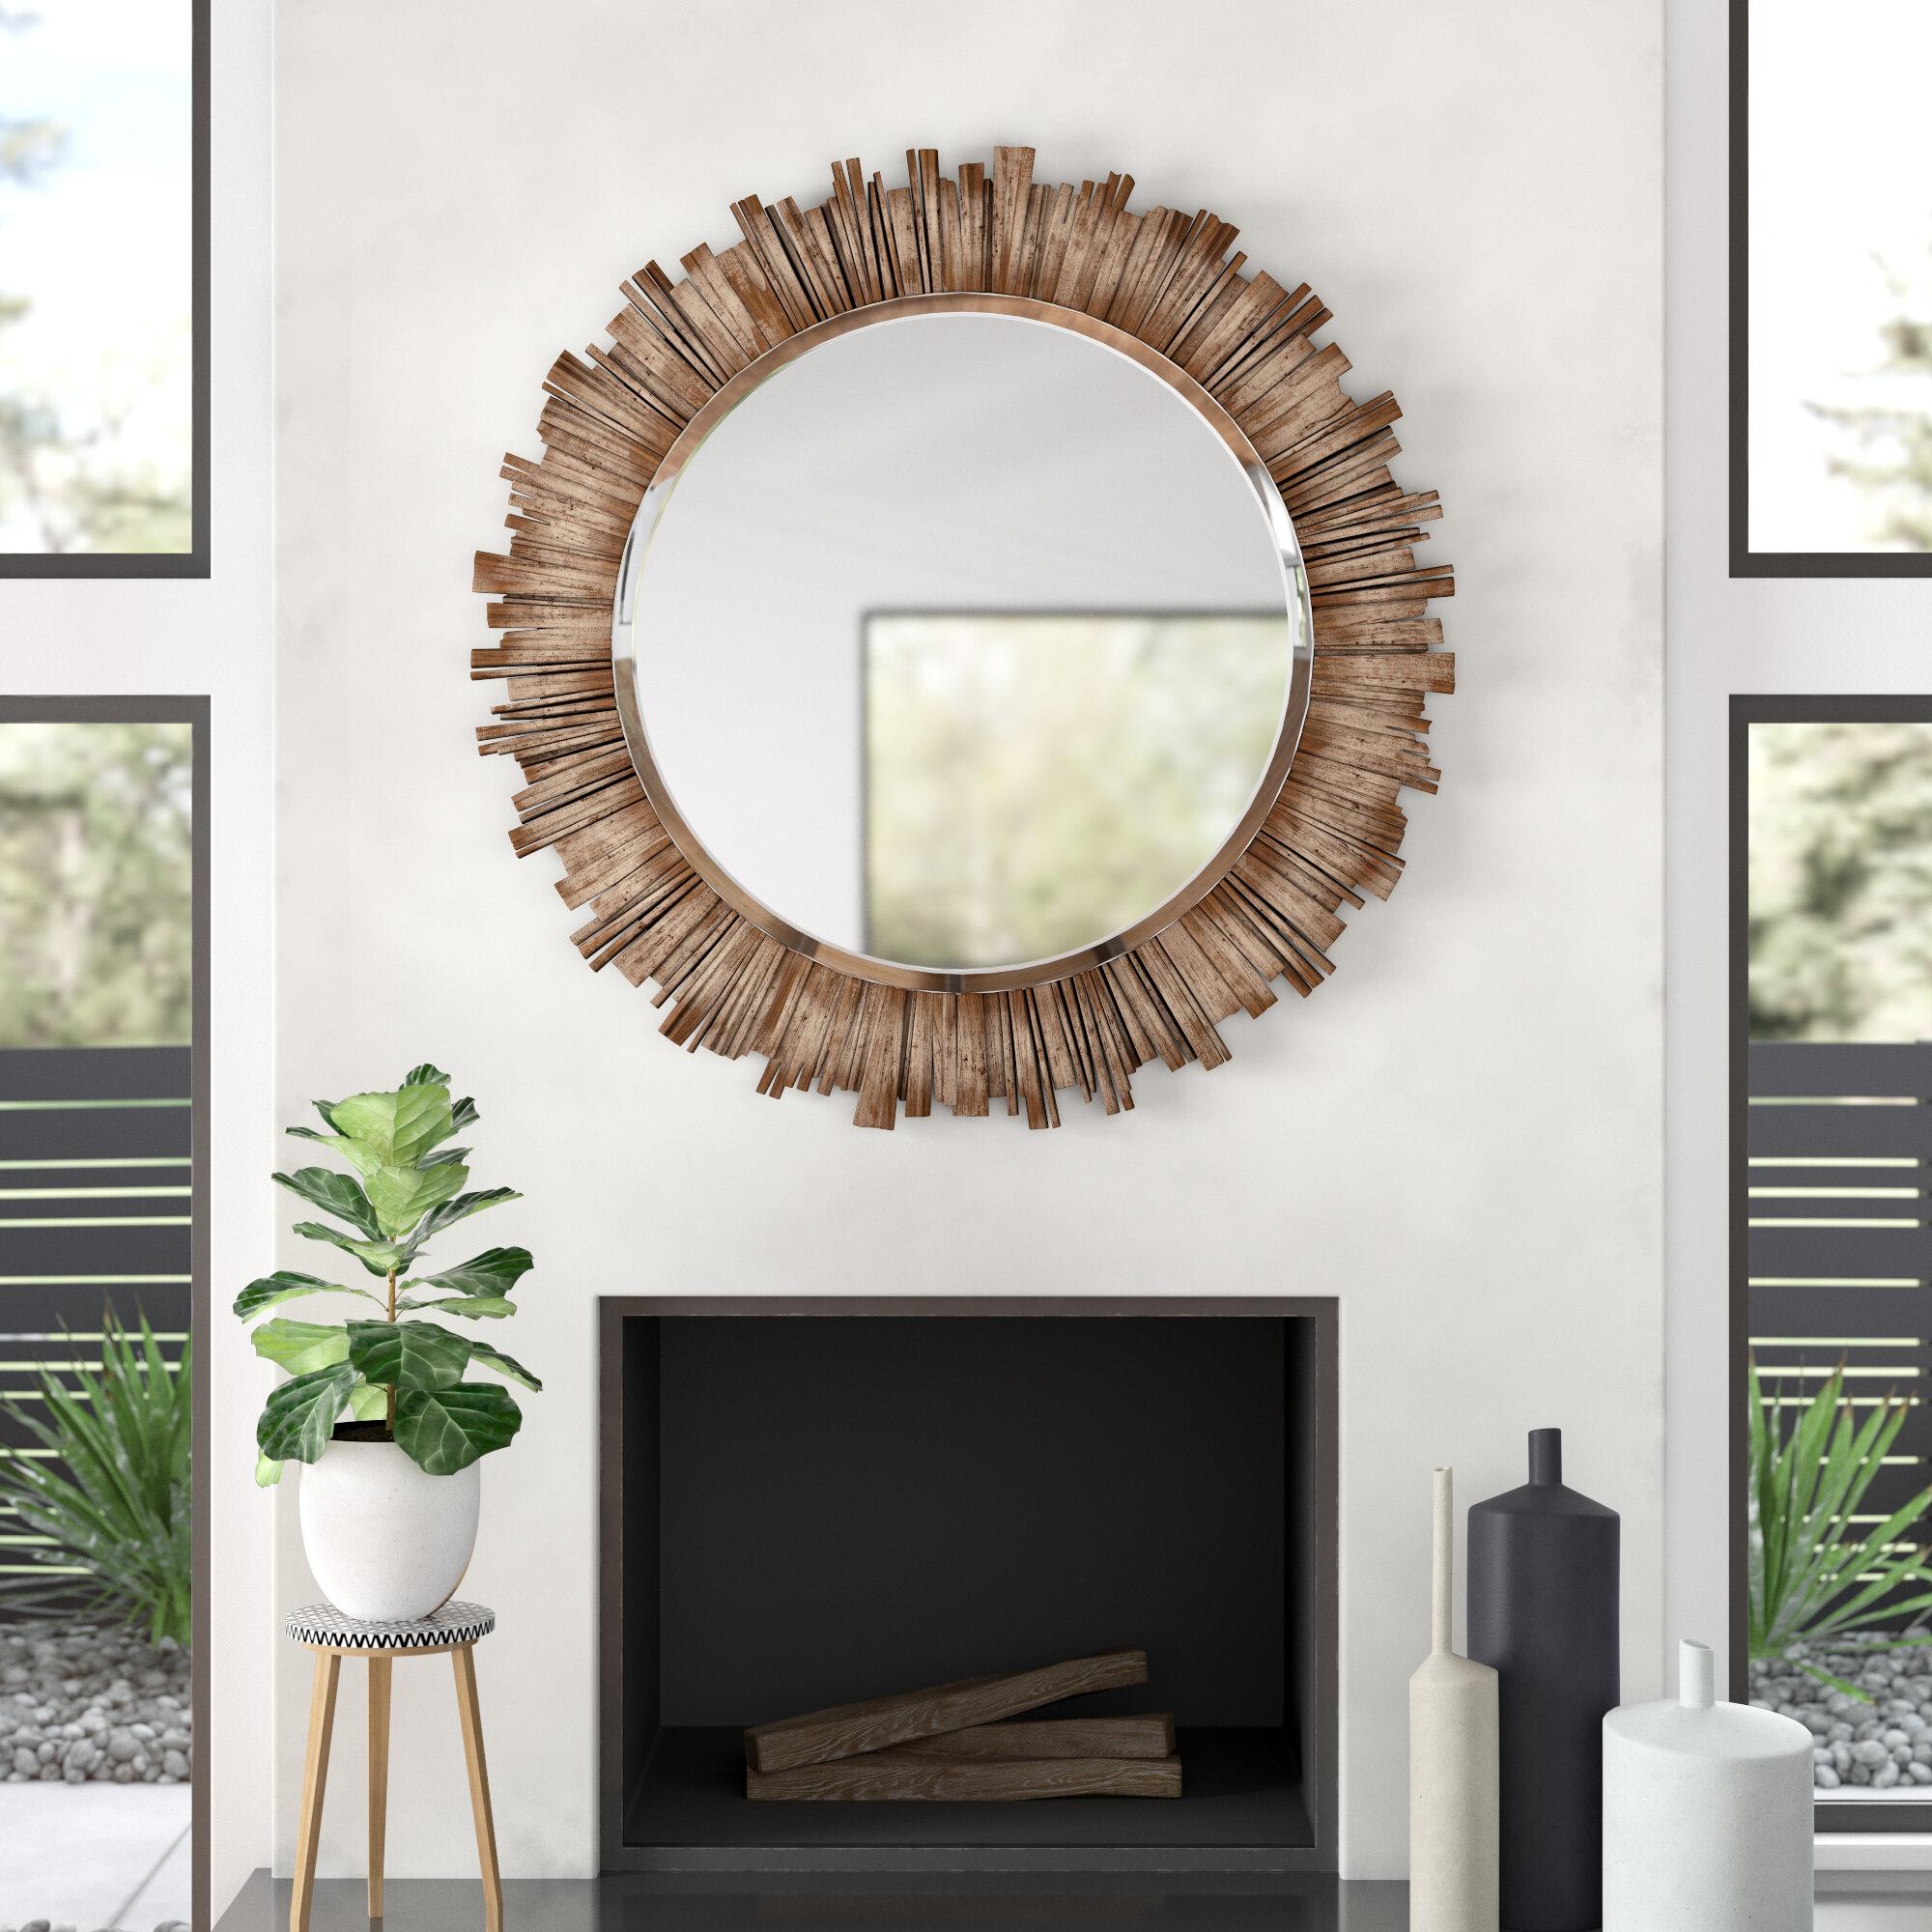 Modern Horizontal And Vertical Sunburst Wall Mirrors | Allmodern With Estrela Modern Sunburst Metal Wall Mirrors (View 12 of 30)